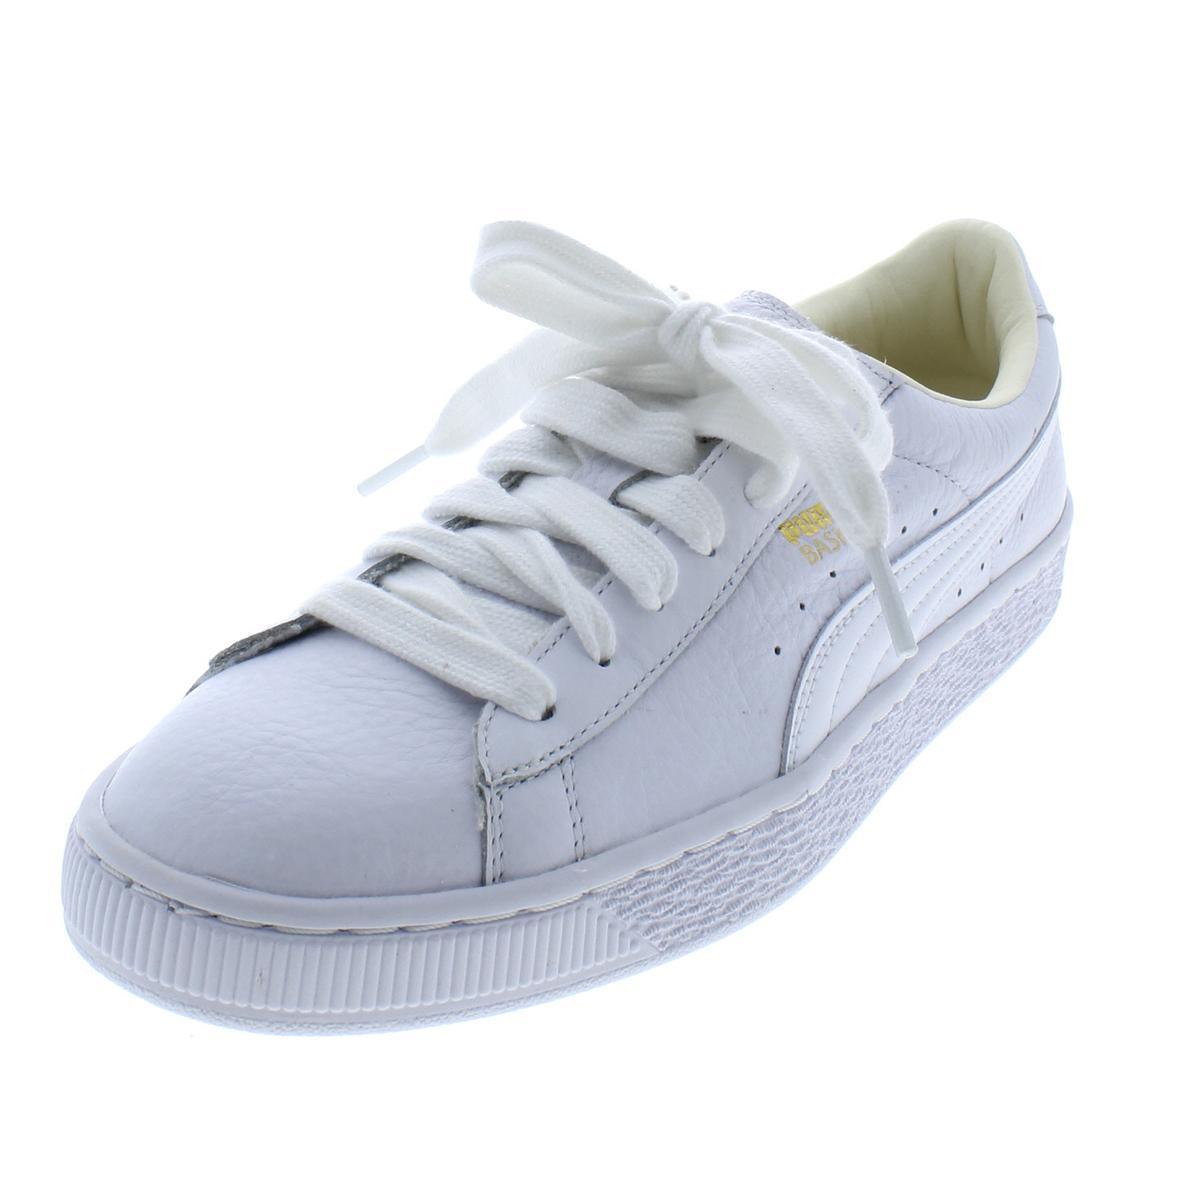 Details about Puma Womens Basket Classic White Fashion Sneakers 8.5 Medium  (B 9b363d1cbe89f